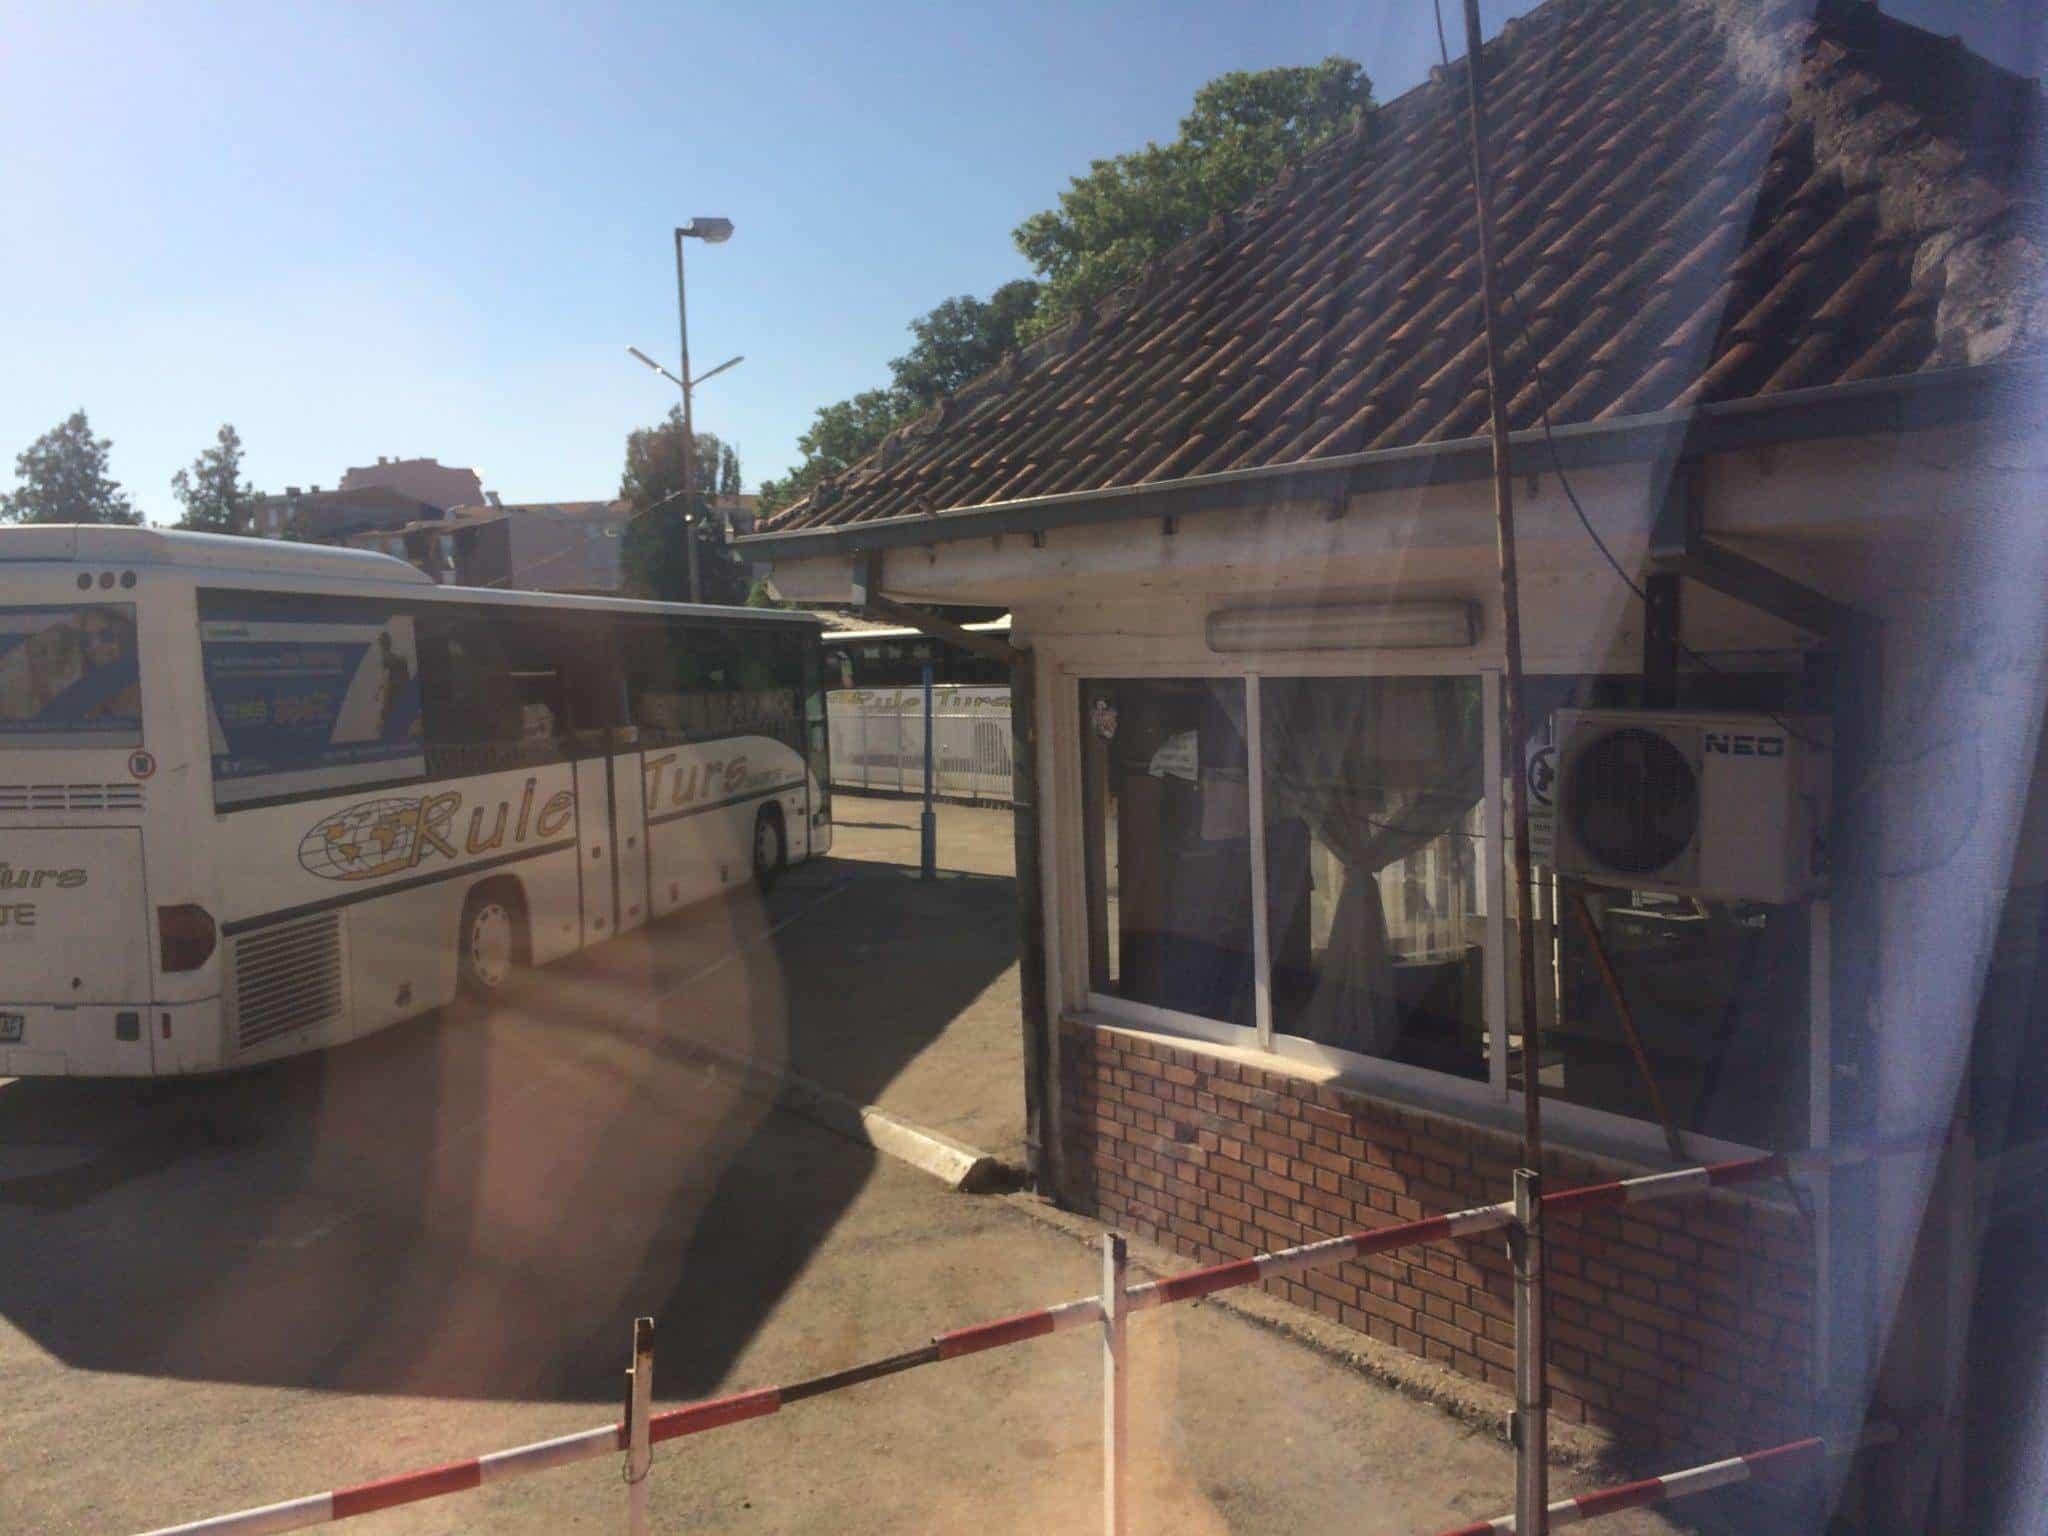 Entering the Kumanovo Bus Station